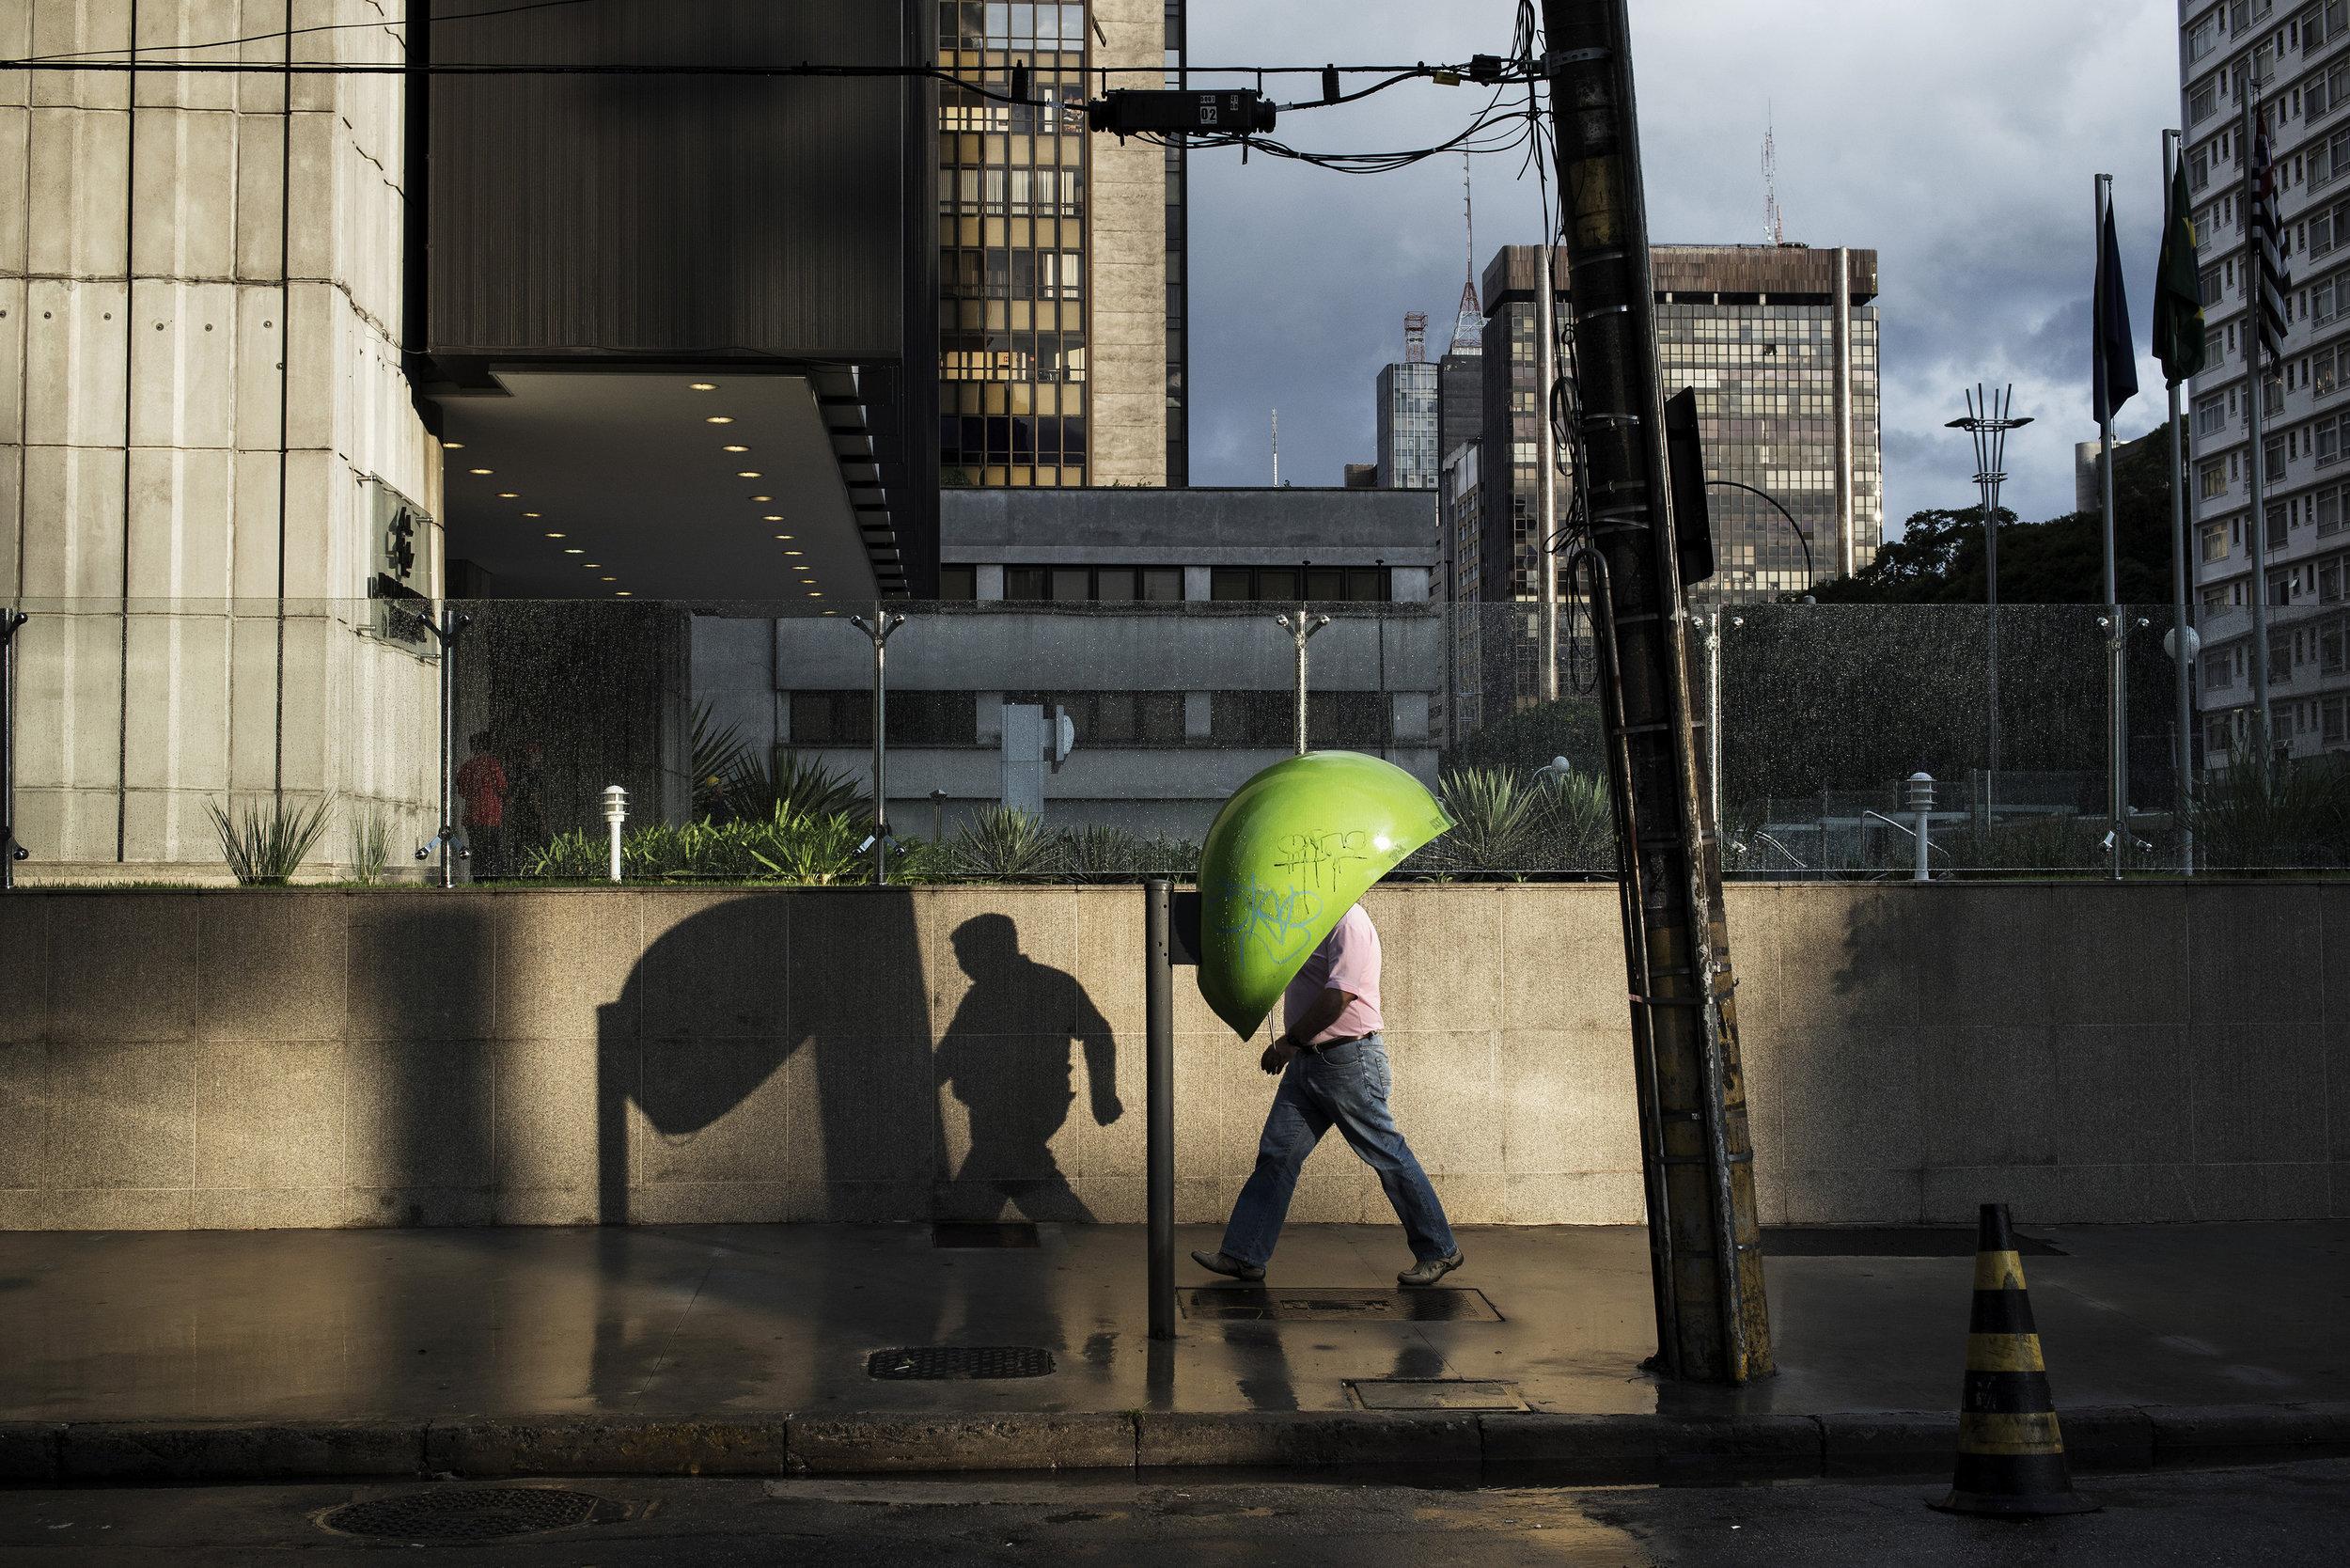 Orelhão, São Paulo